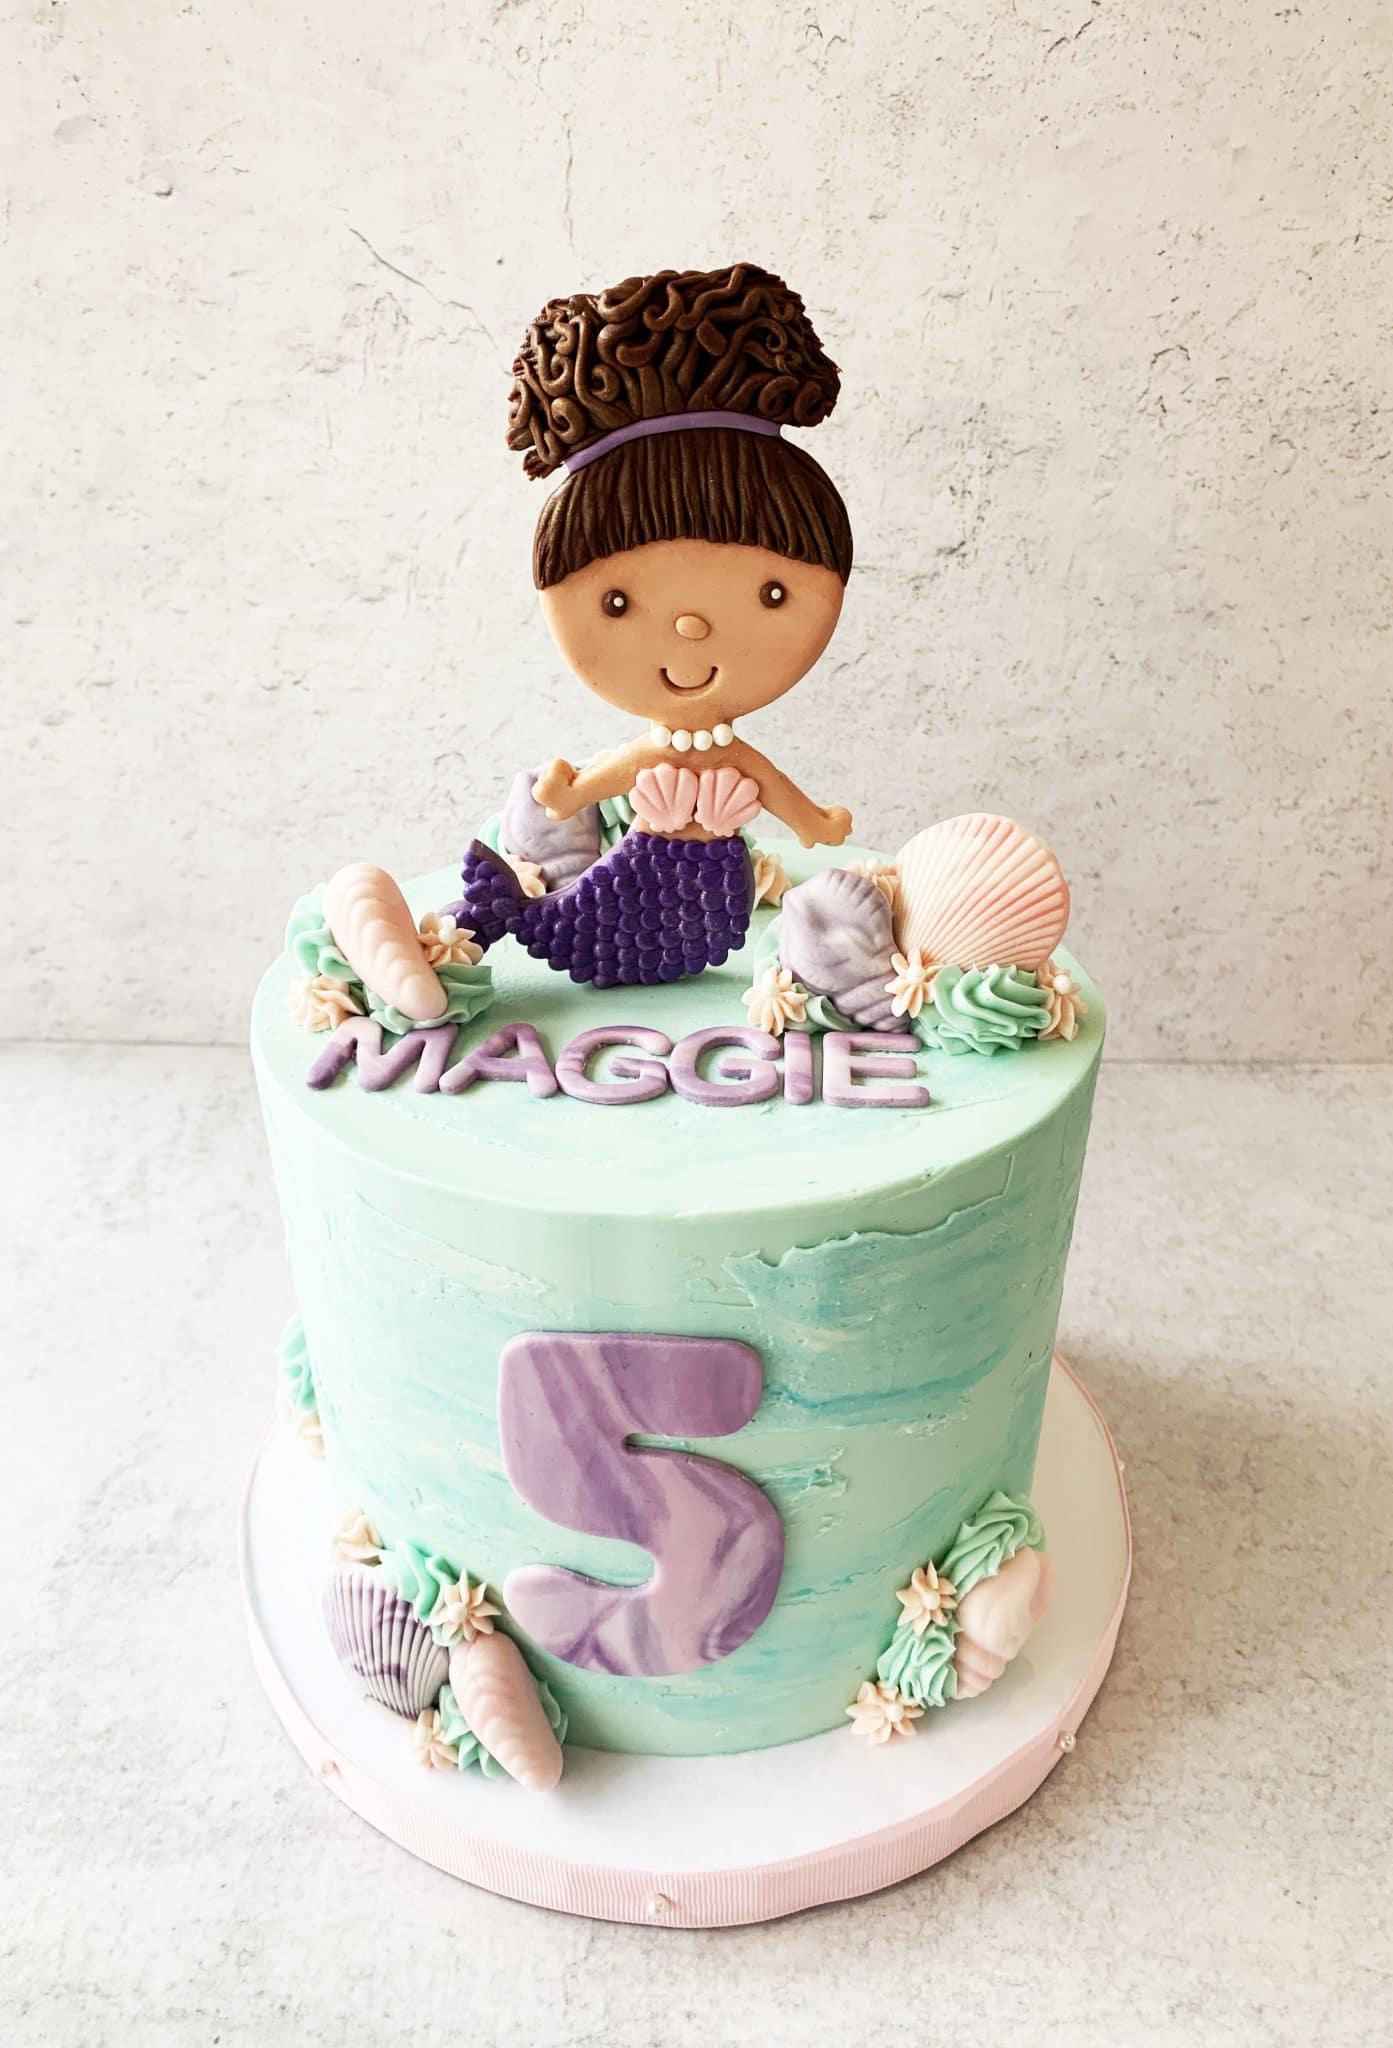 mermaid-cake-whipped-bakeshop